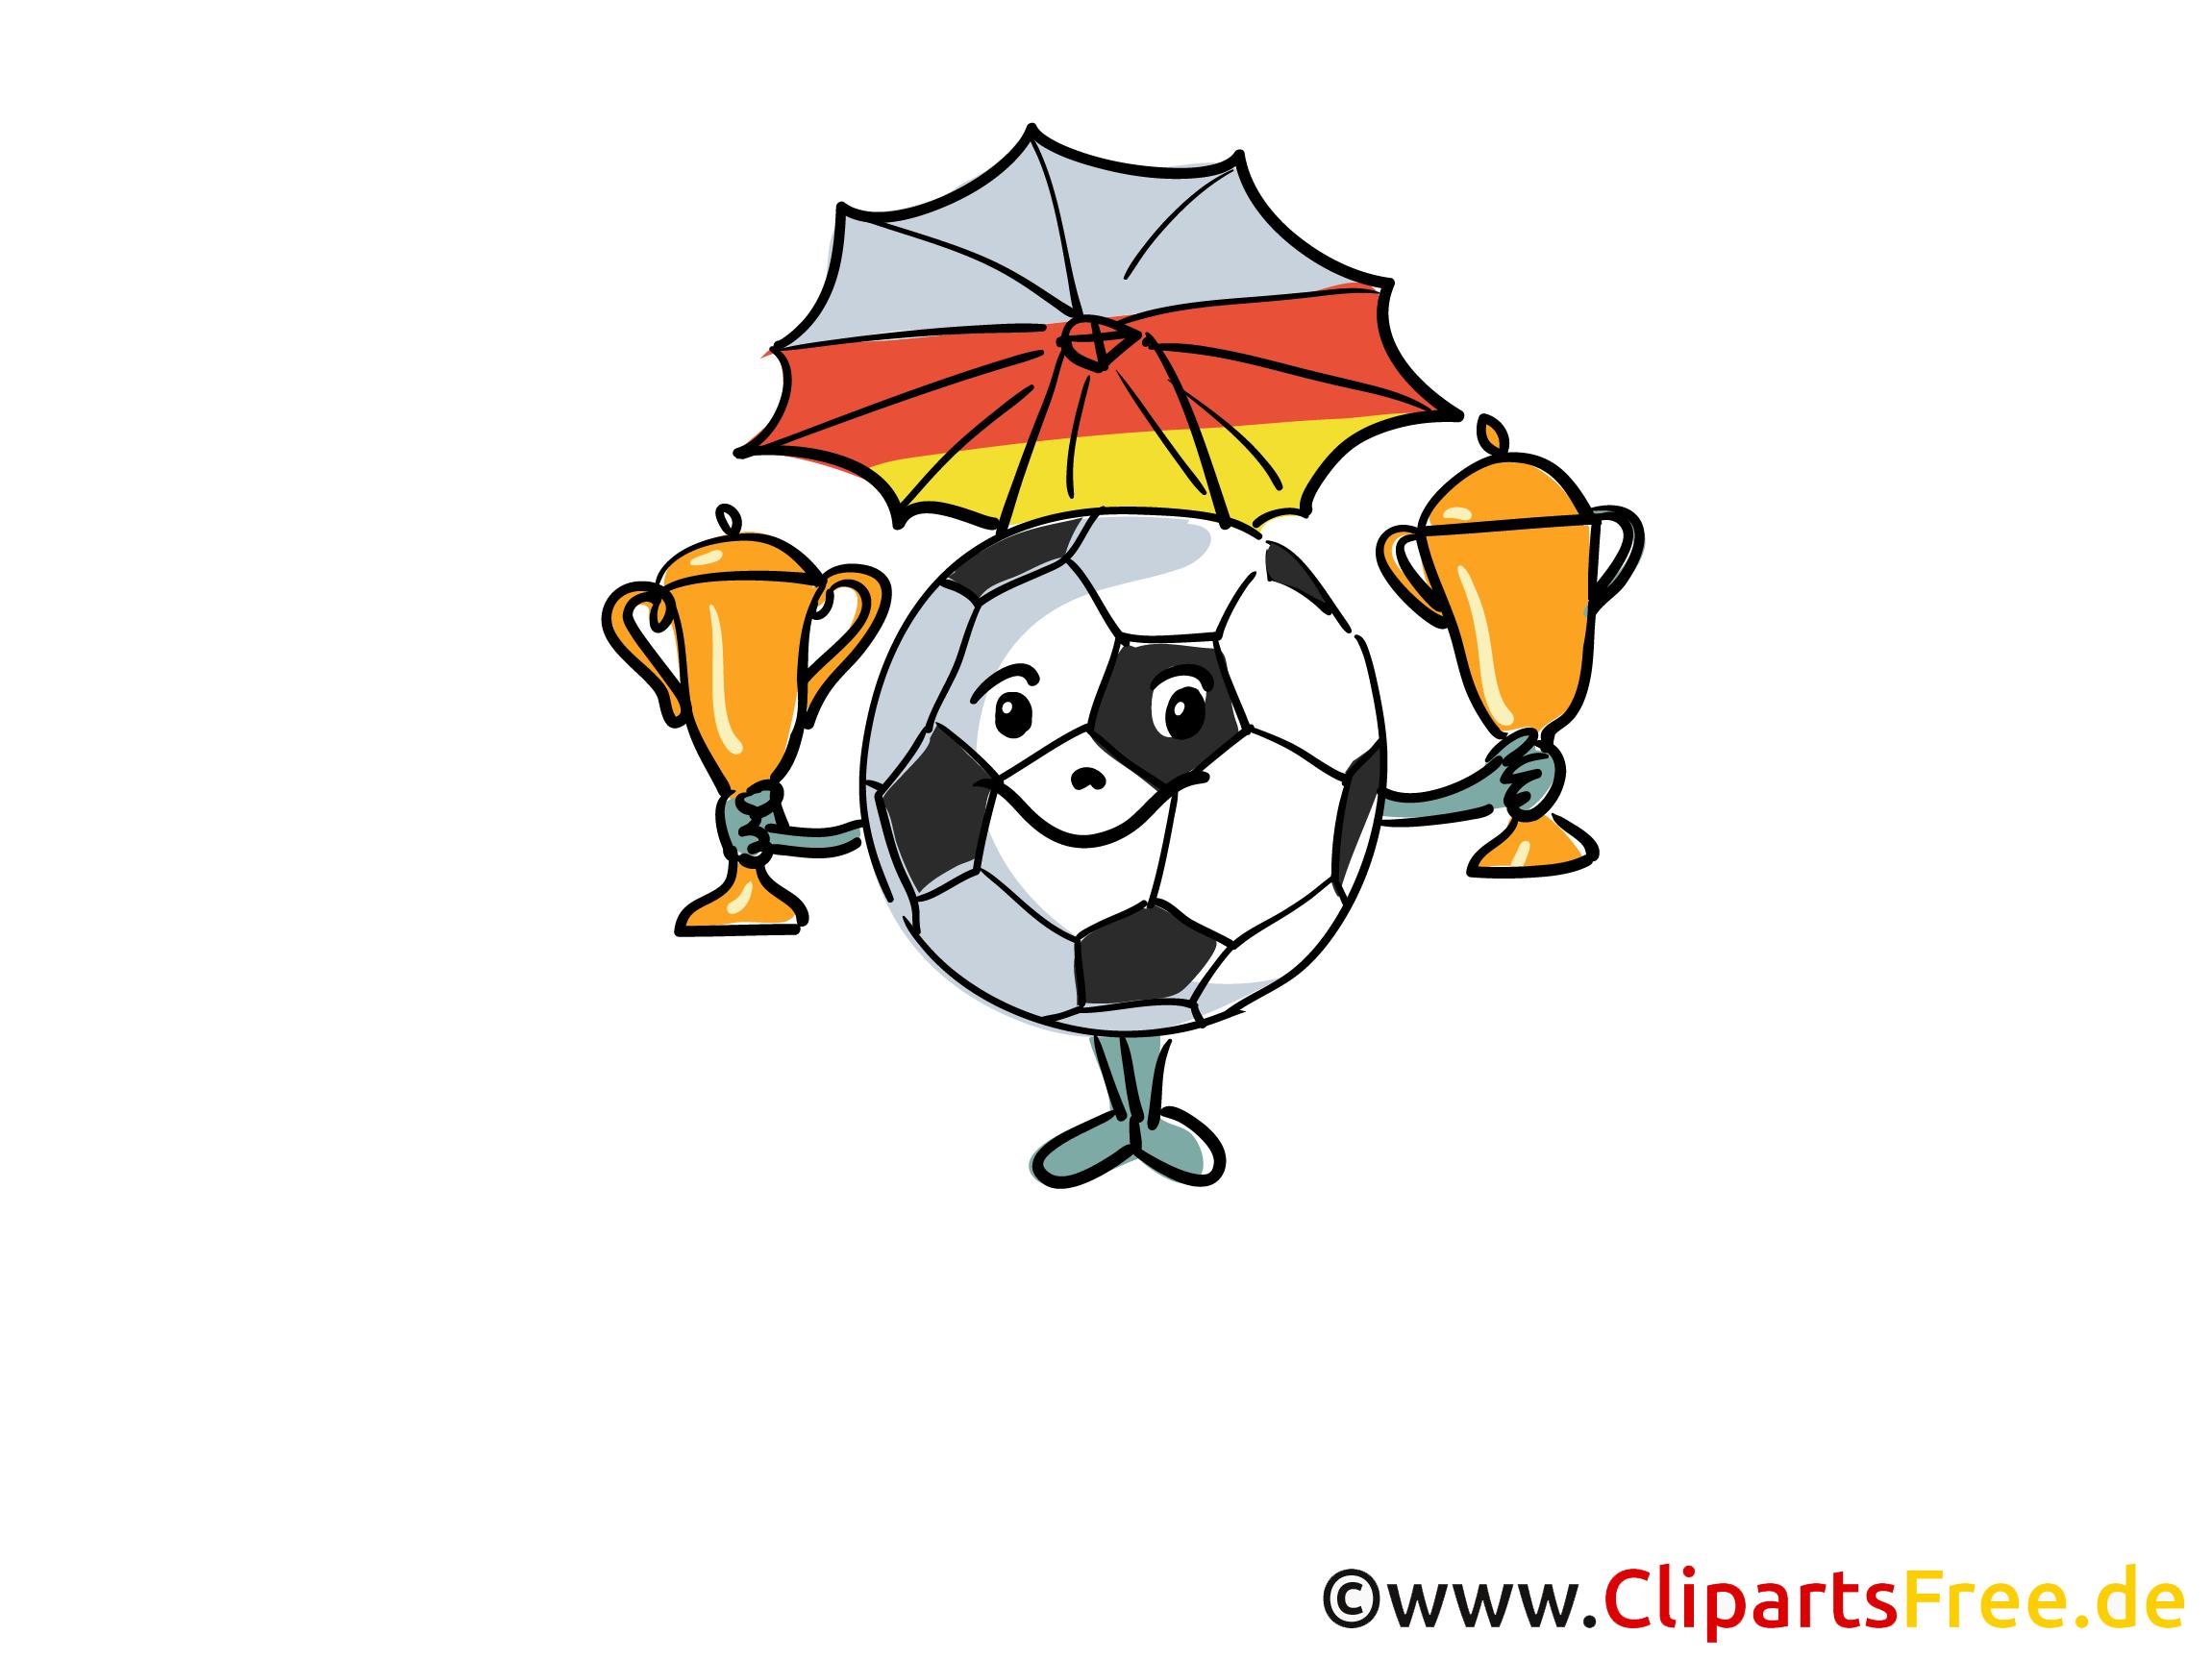 Clipart Fussballpokals